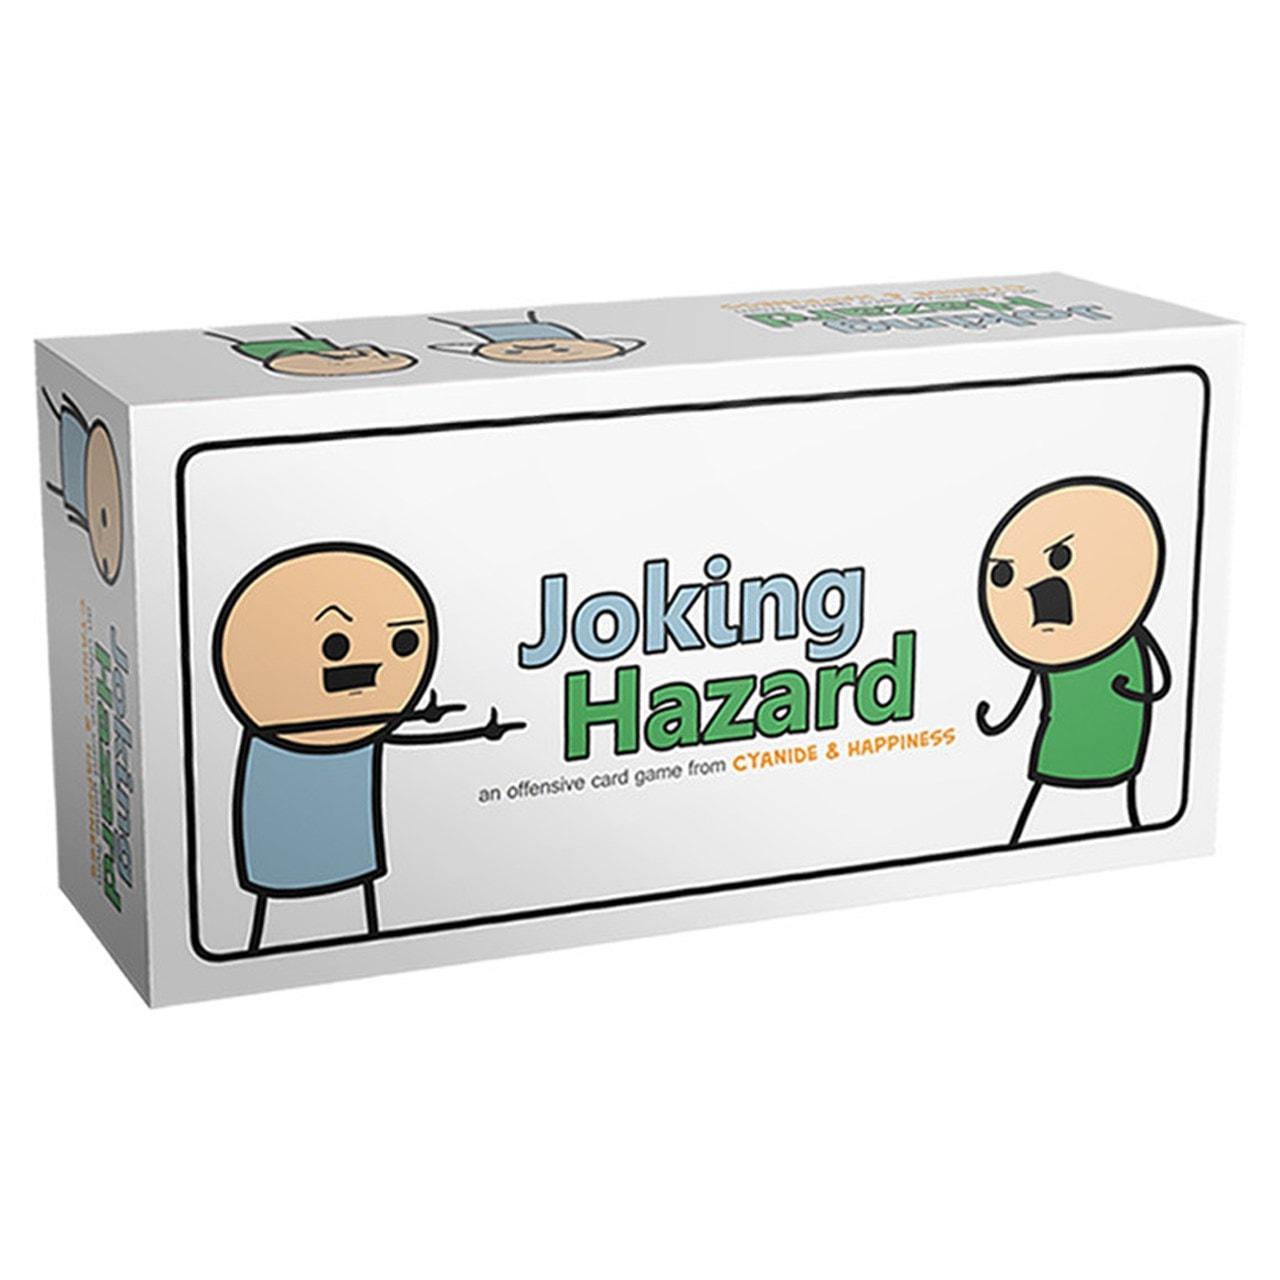 Joking Hazard by Cyanide & Happiness - 1